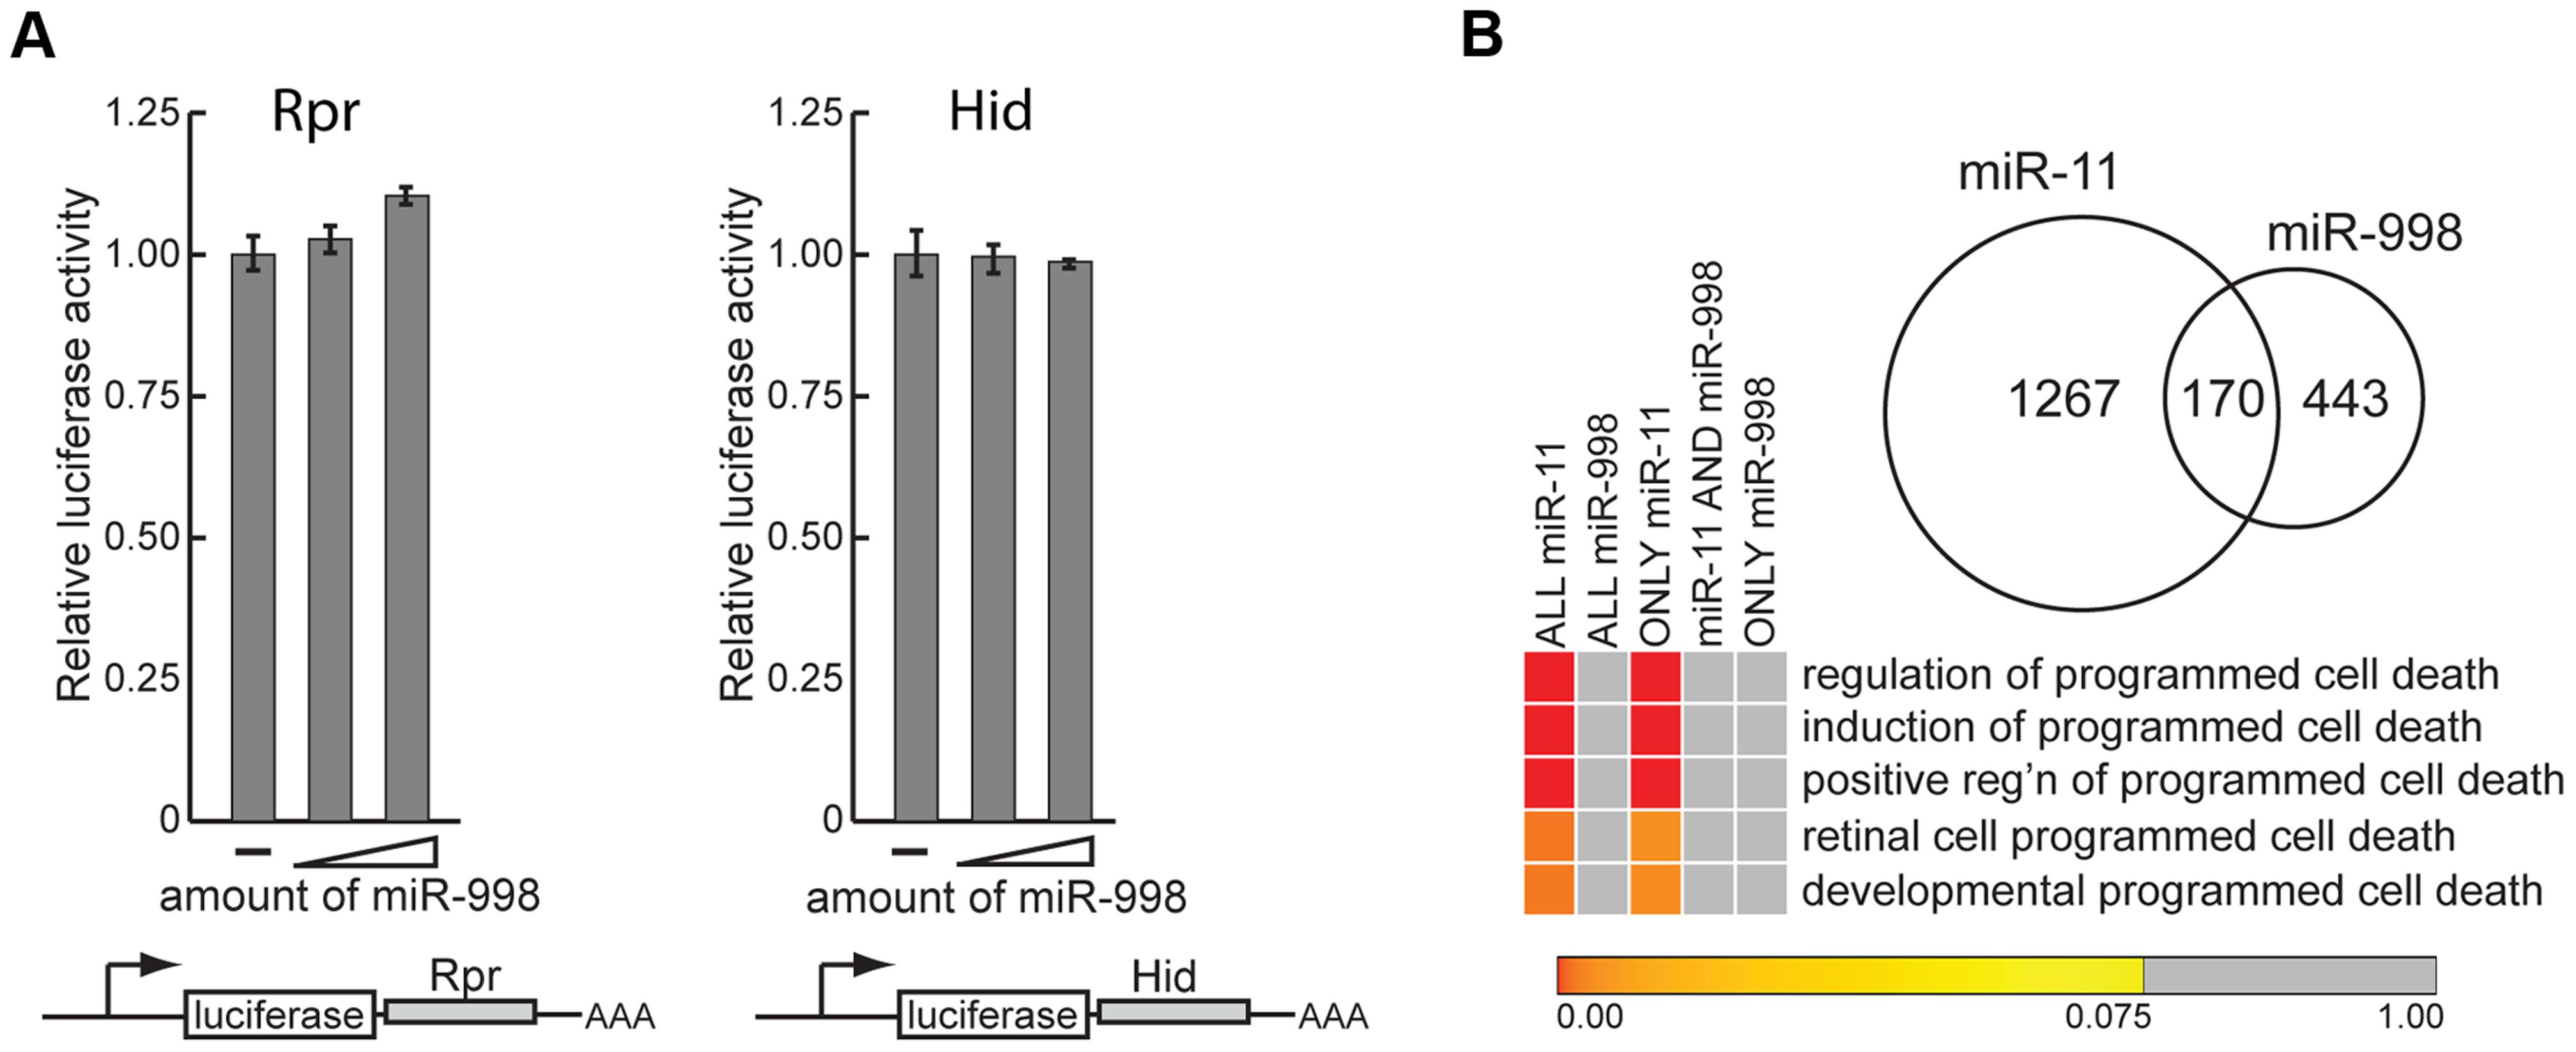 miR-11 and miR-998 limit dE2F-dependent cell death through different targets.